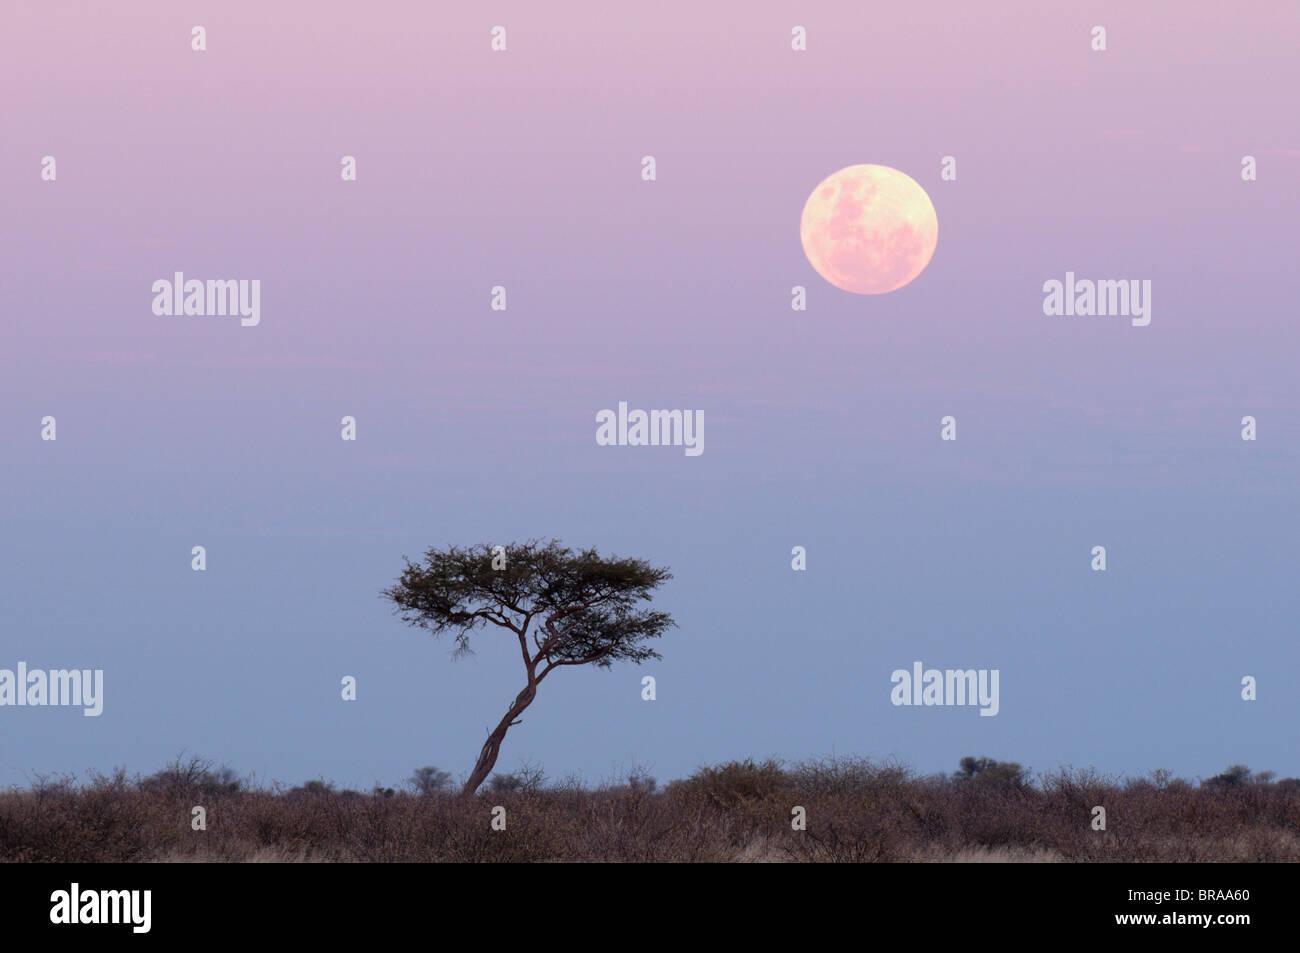 Moonrise, Deception Valley, Central Kalahari Game Reserve, Botswana, Africa - Stock Image